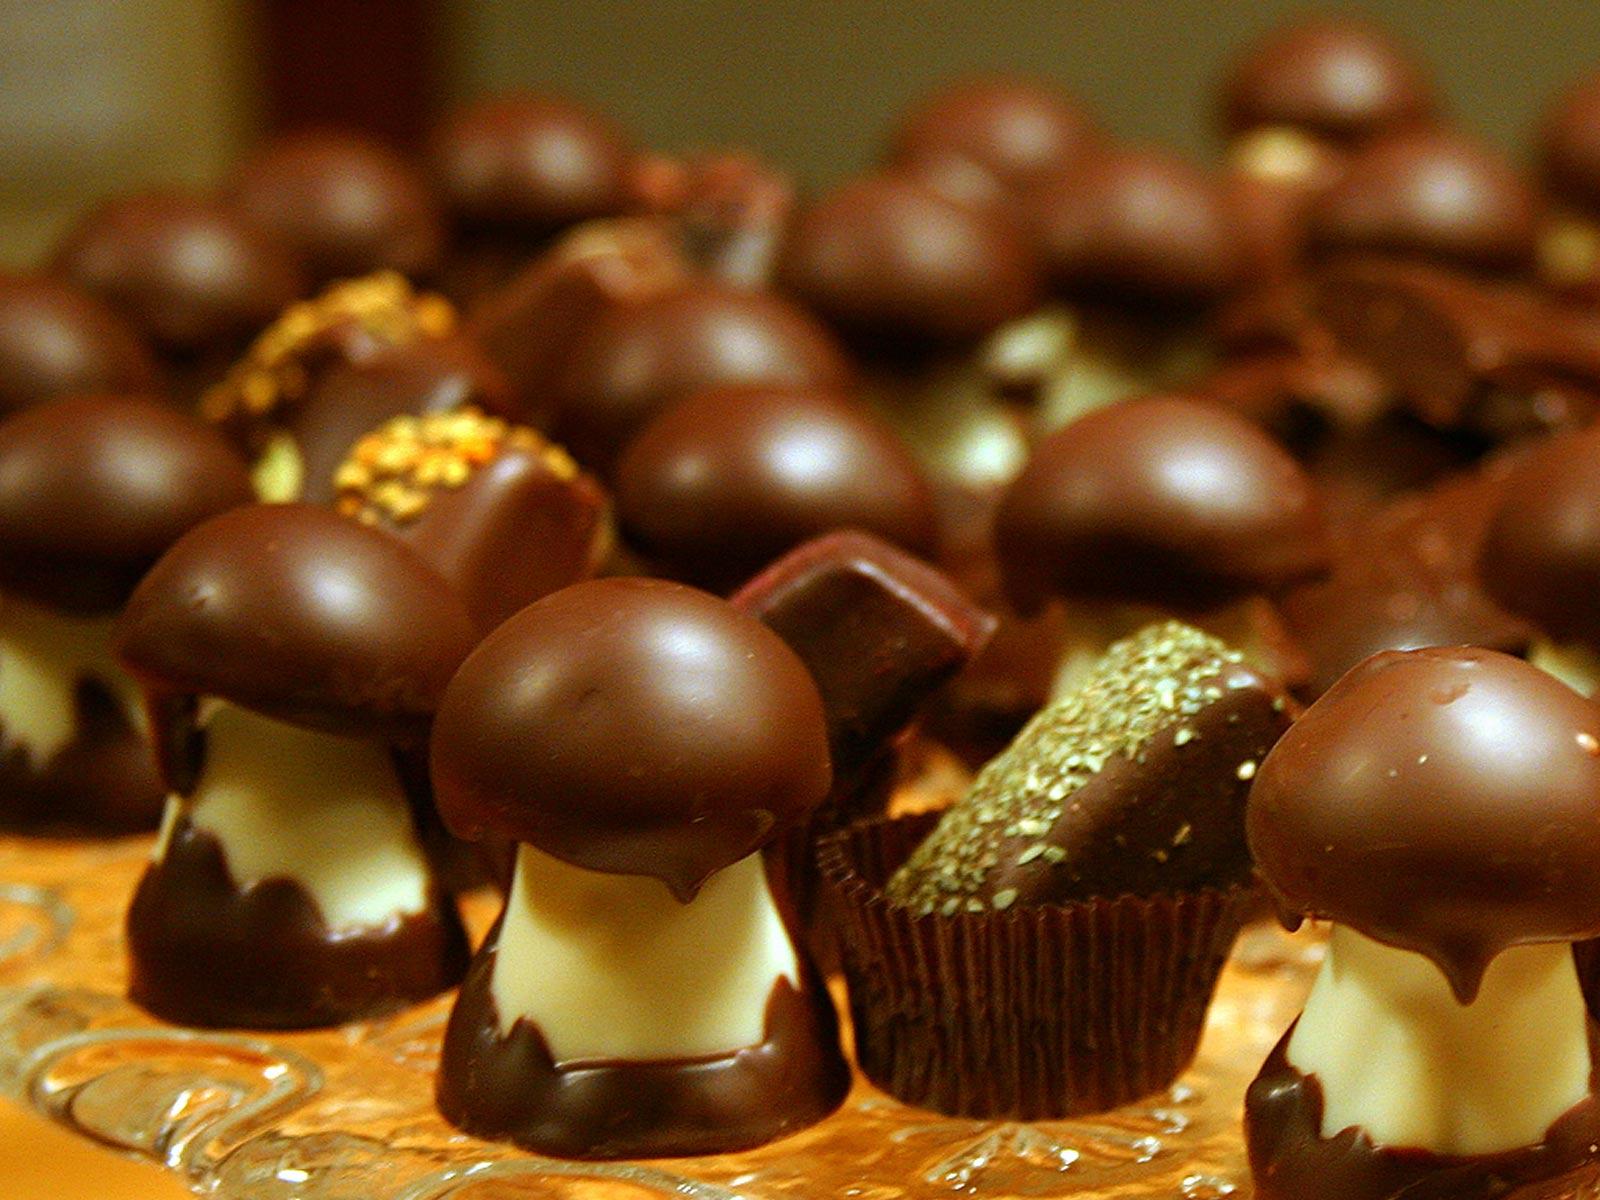 Chocolate   Wallpapers Pictures Pics Photos Images Desktop 1600x1200